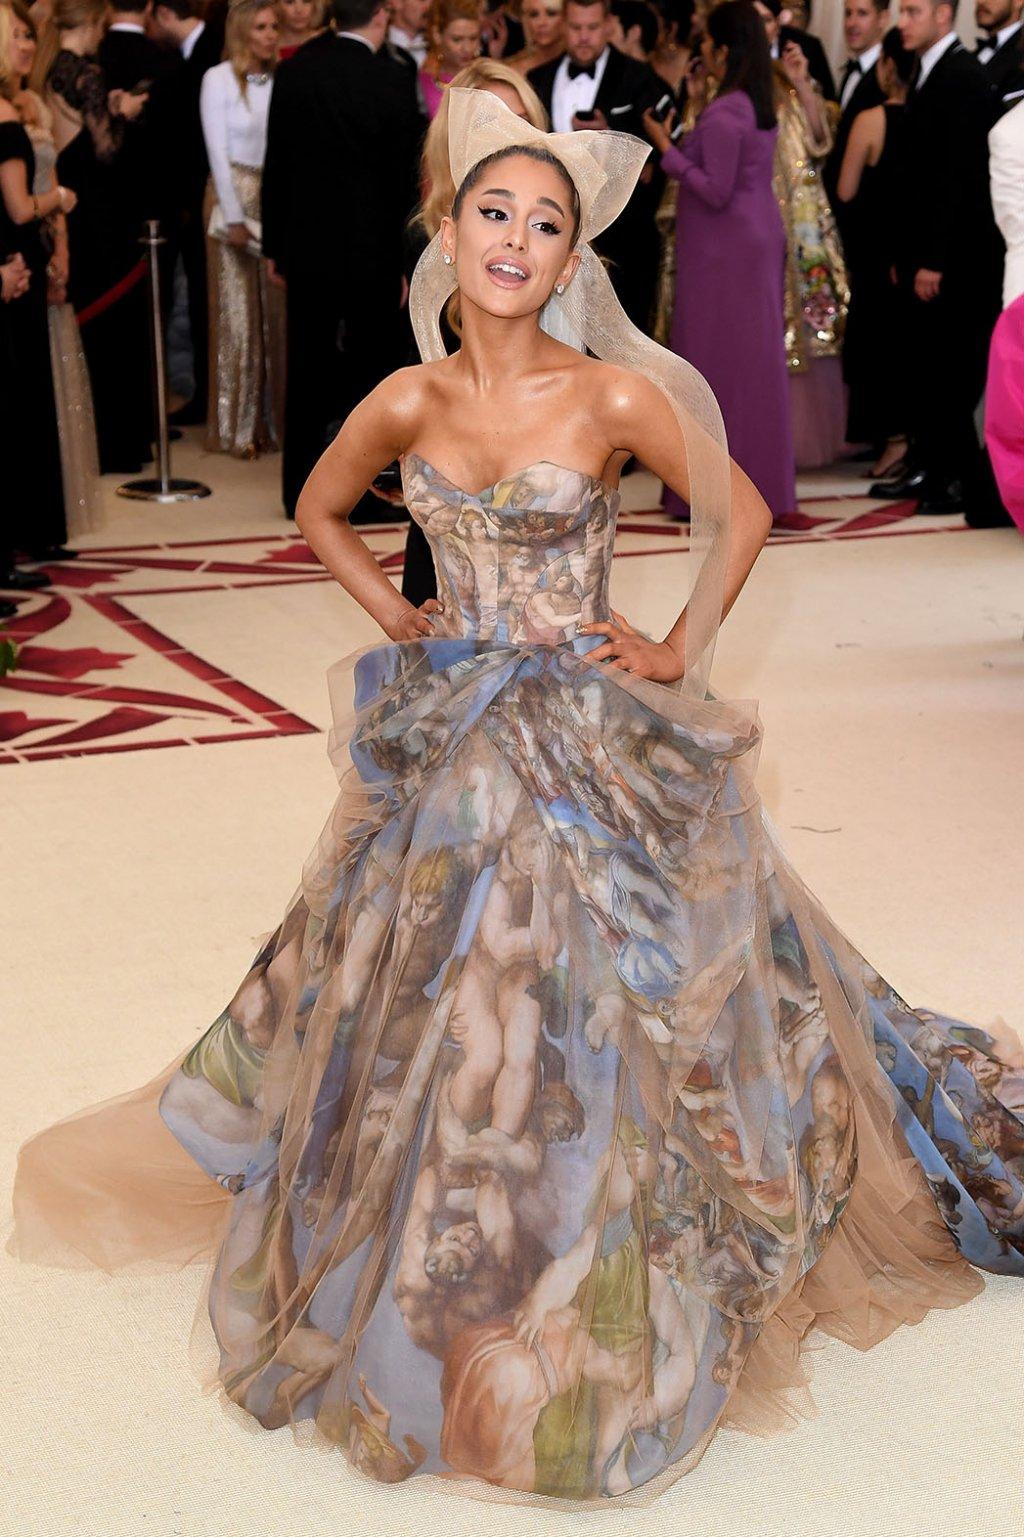 Ariana Grande wearing custom Vera Wang. Picture by Karwai Tang/Getty Images